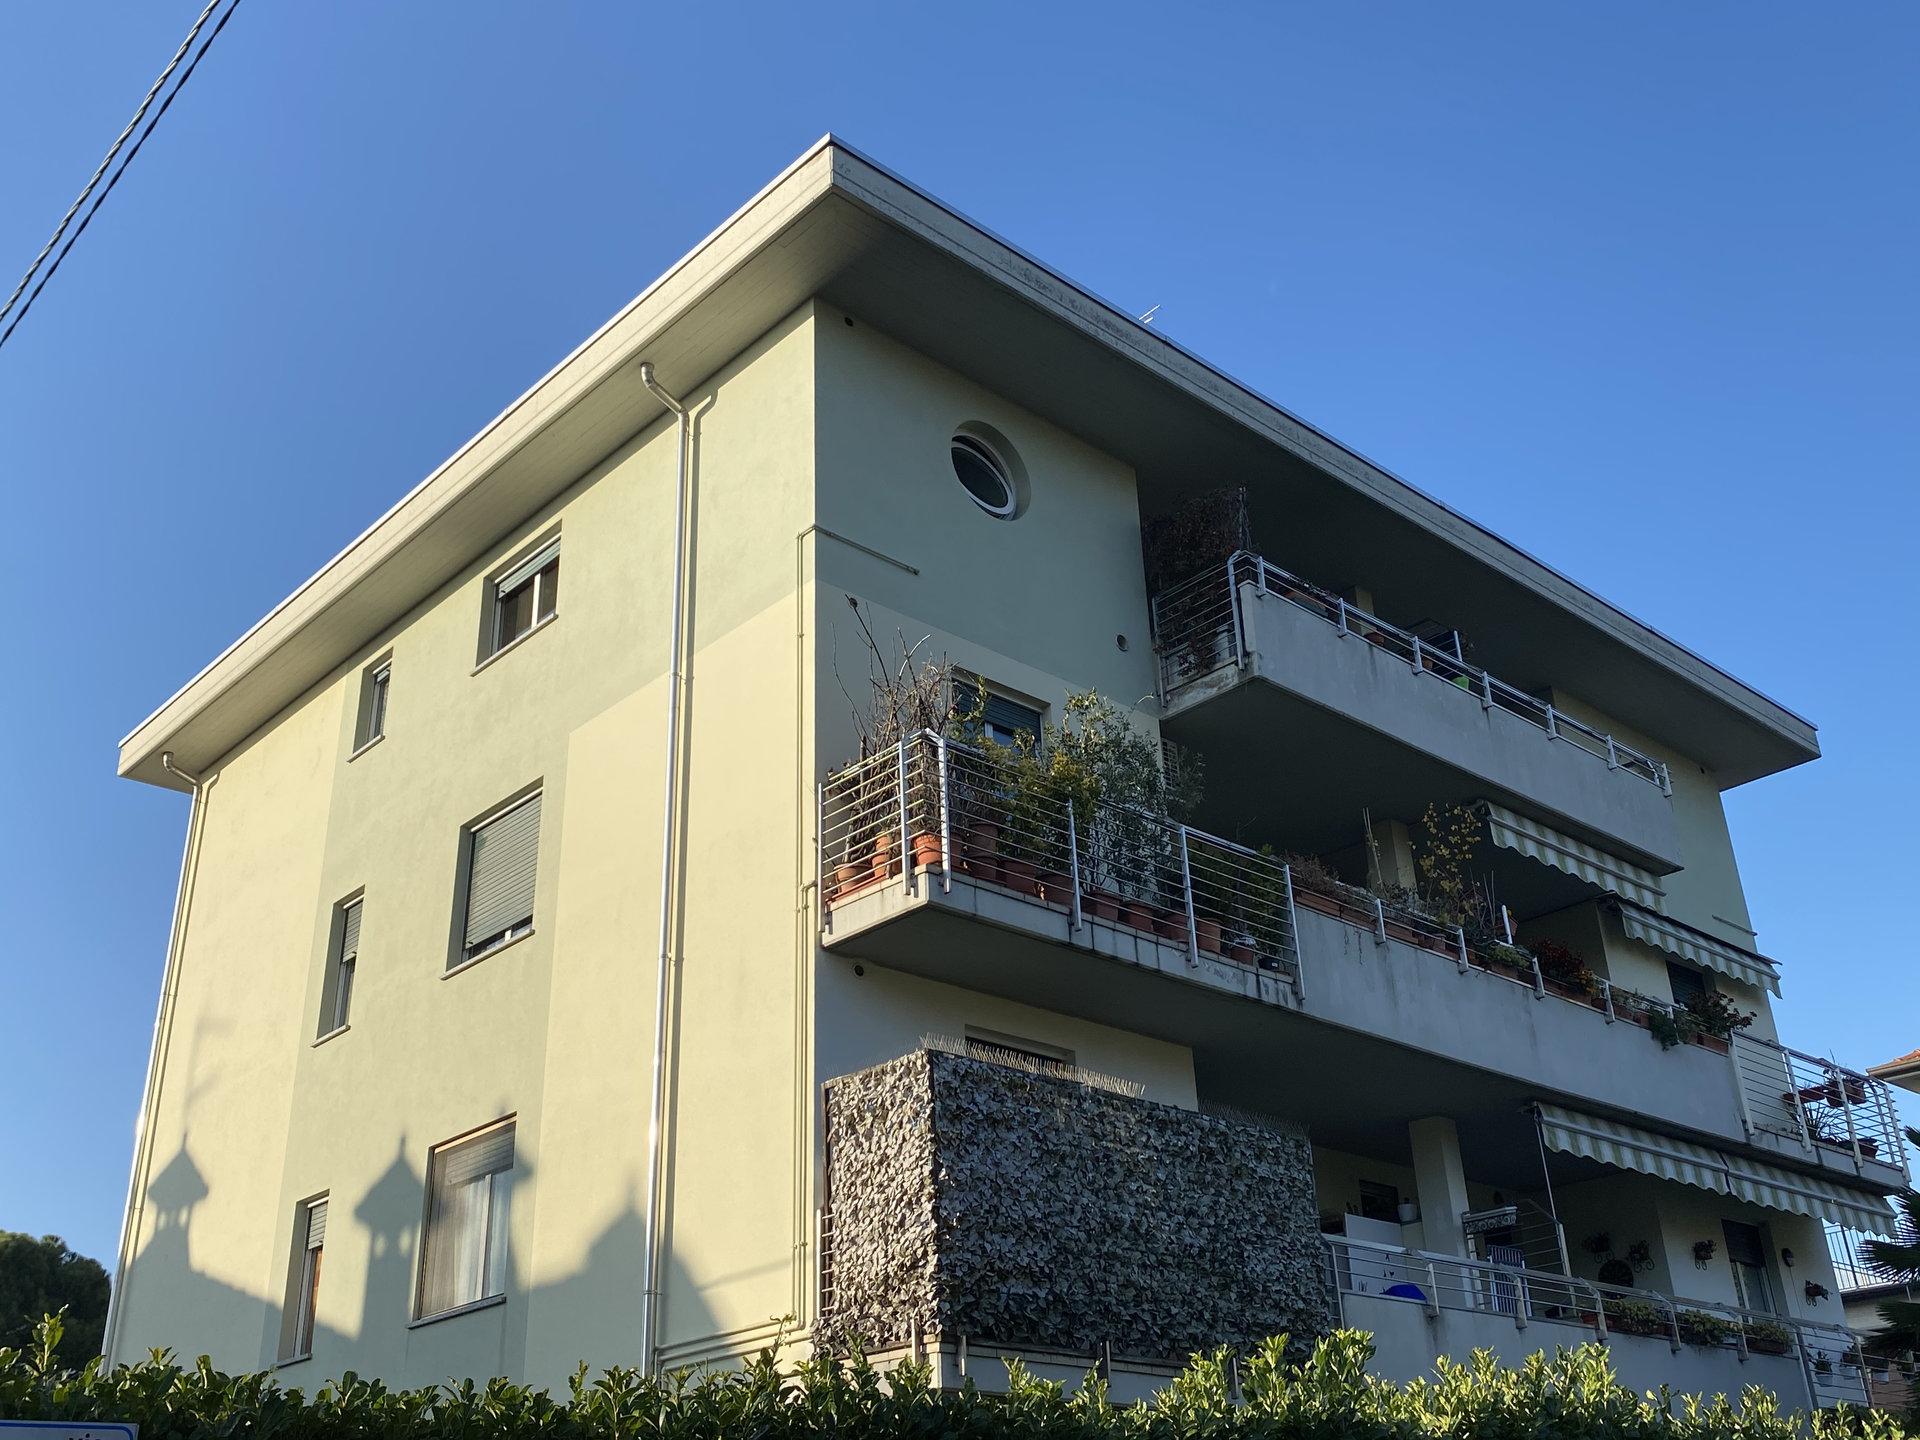 Sale Apartment - Cantù - Italy